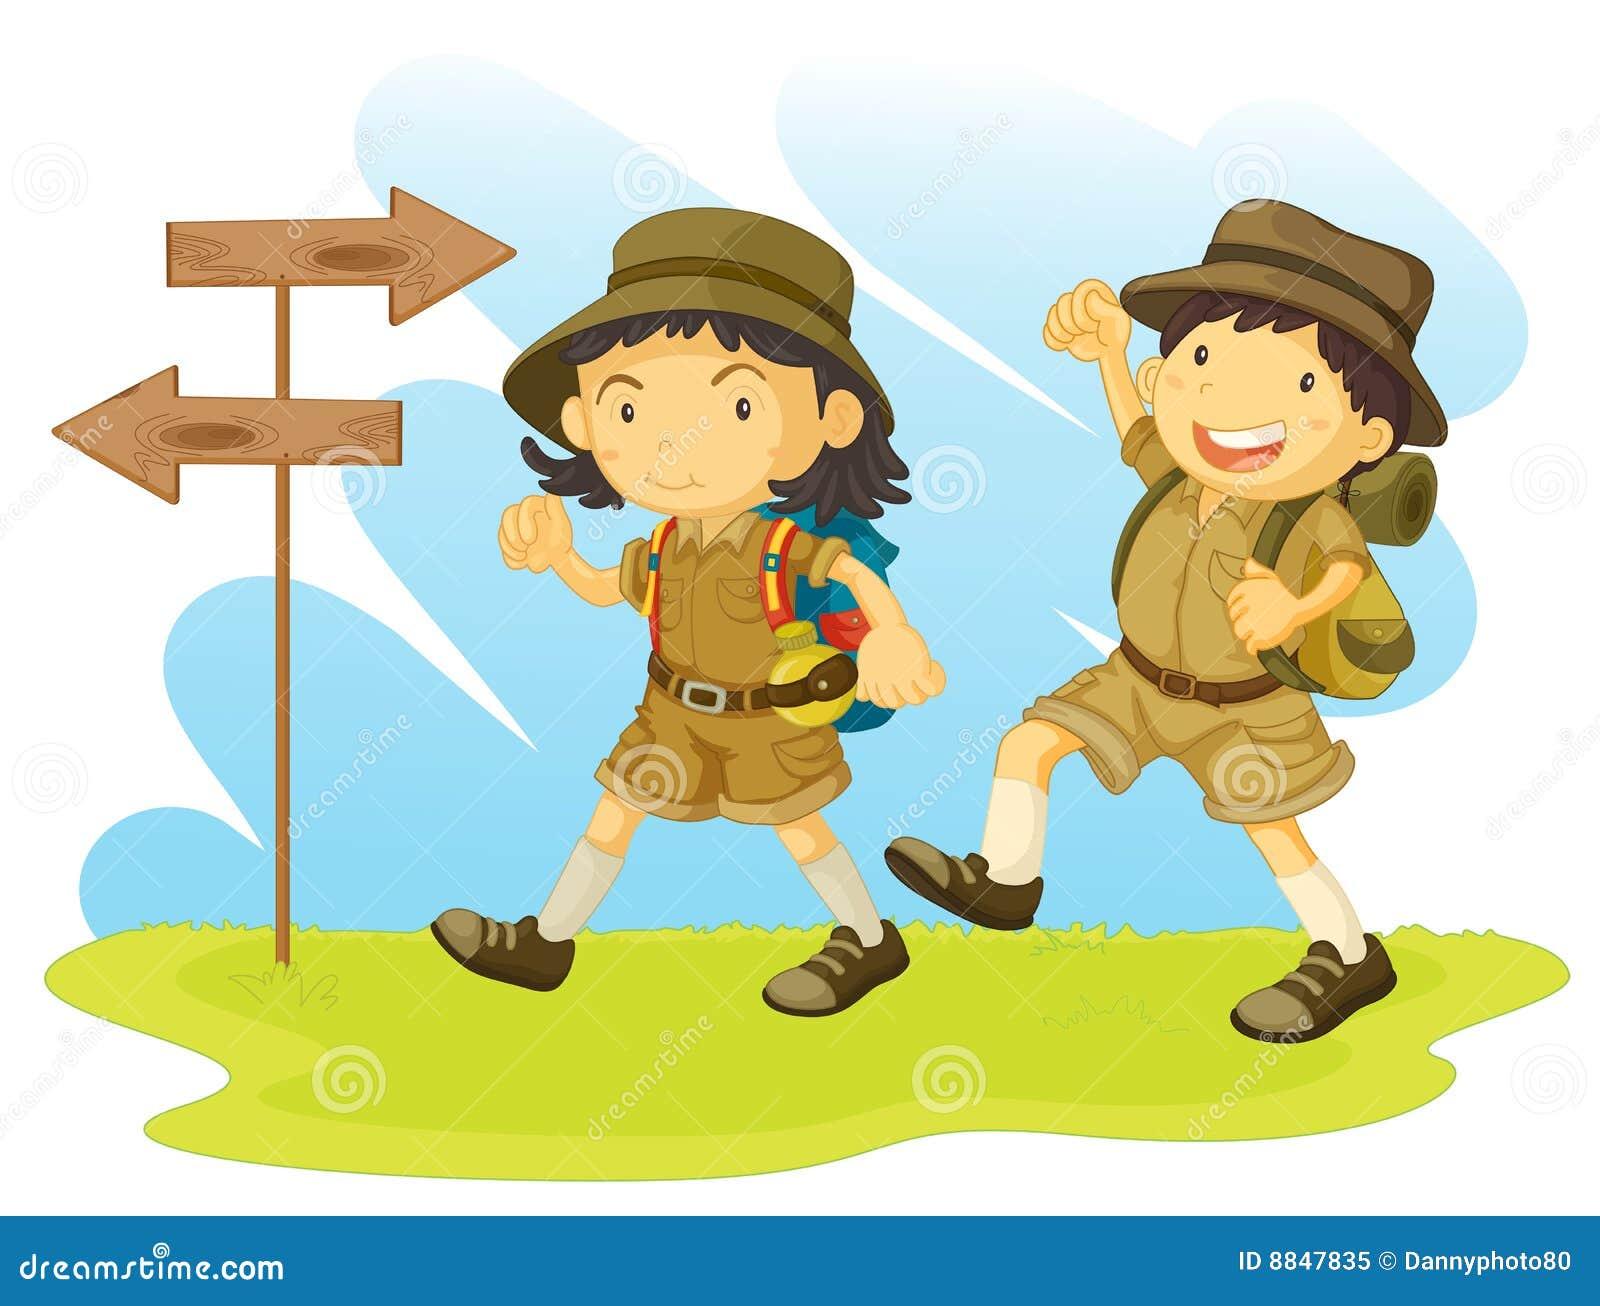 a boy scout royalty free stock photo   image 8847835